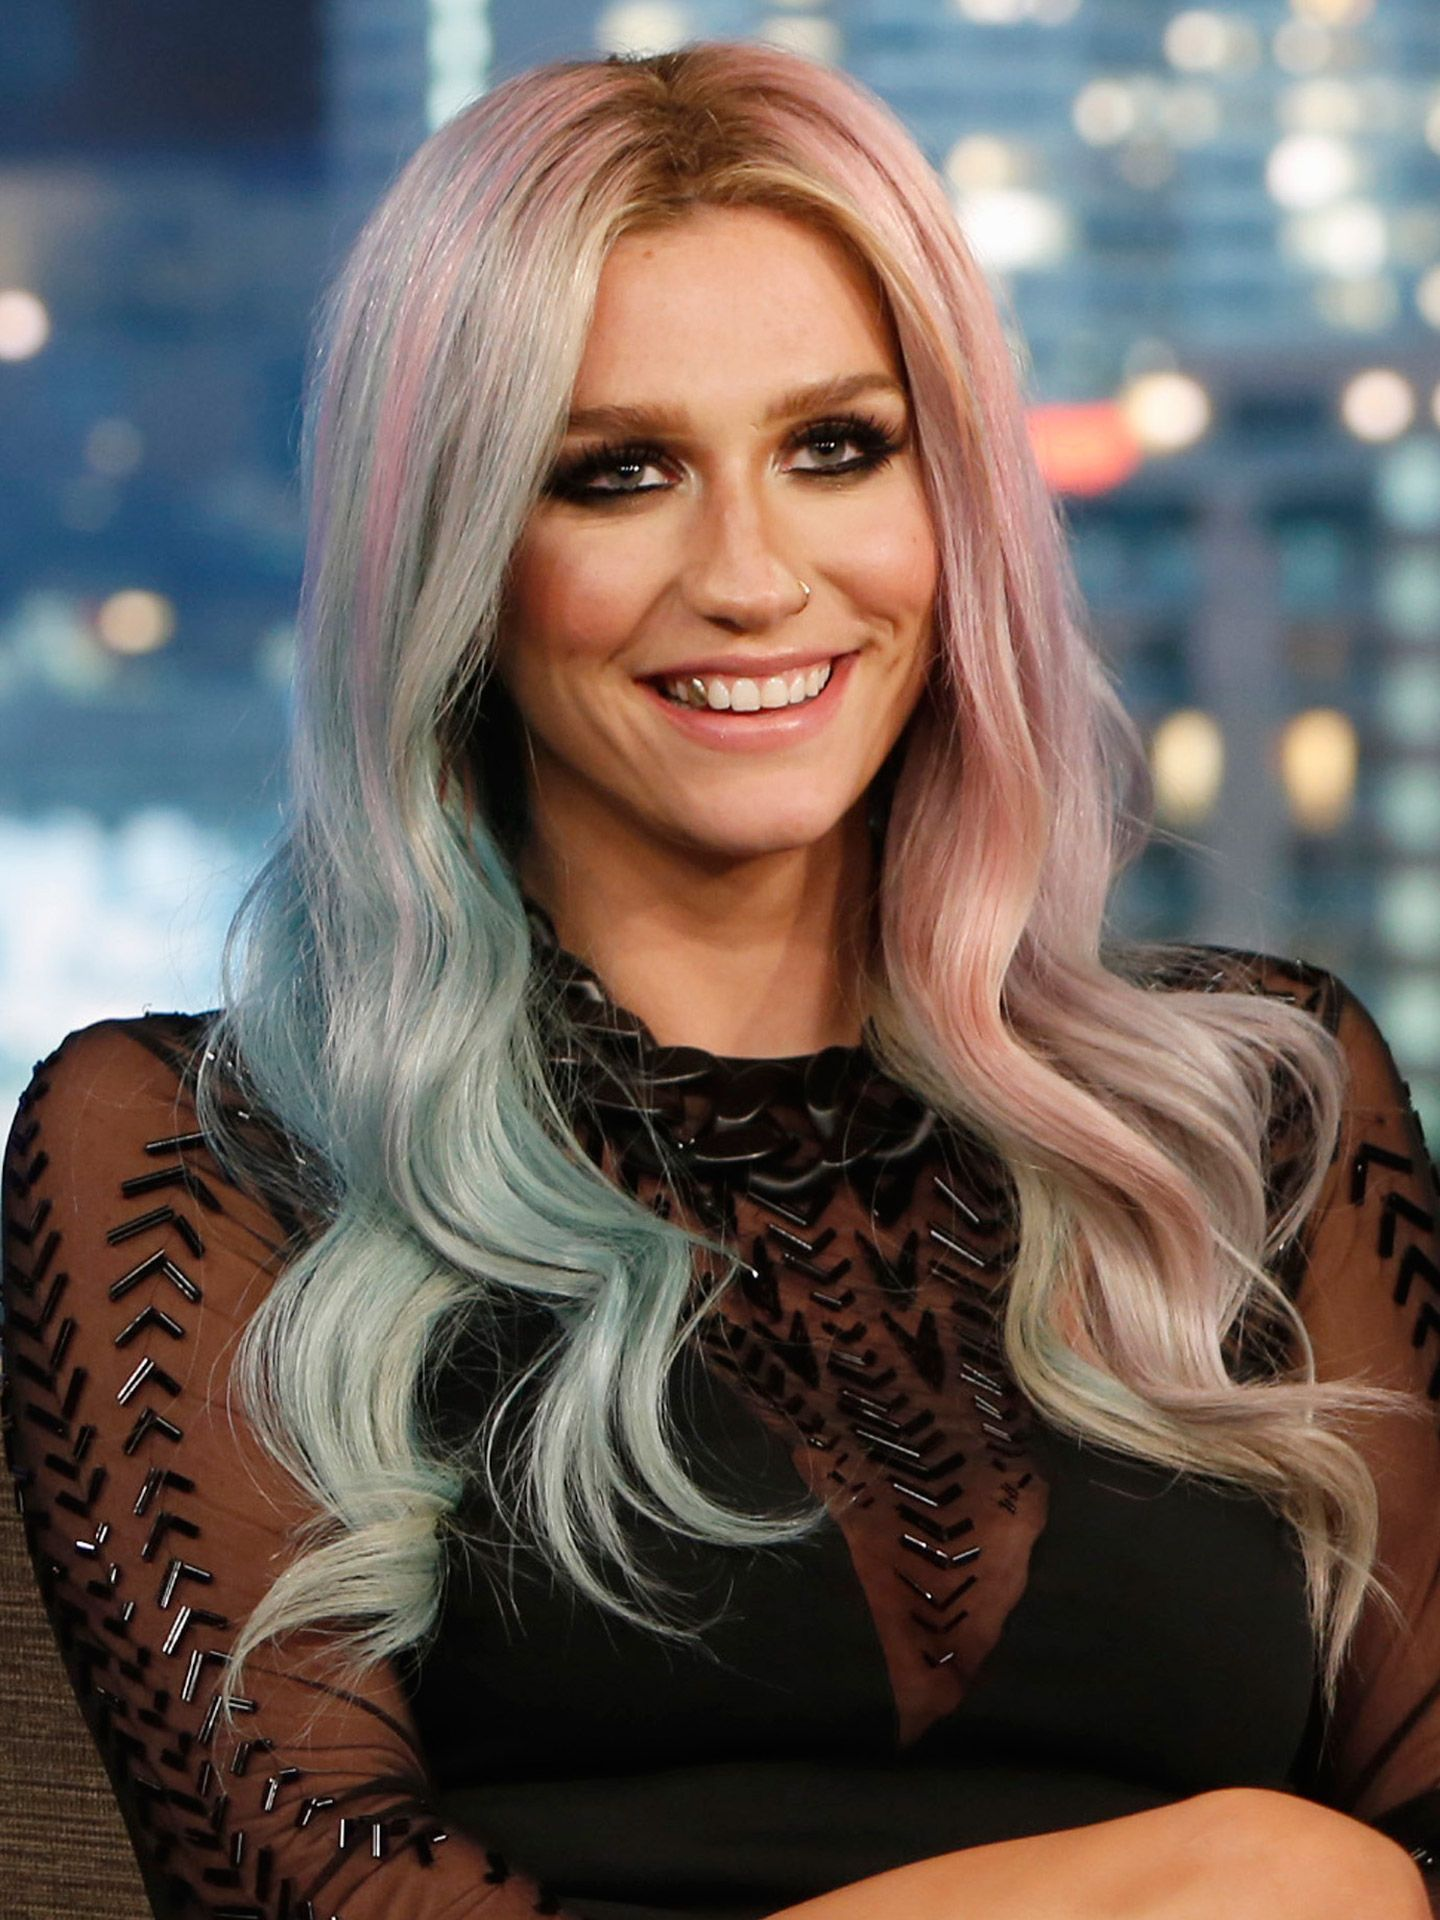 Loreal hair color quiz - Loreal Hair Color Quiz 79